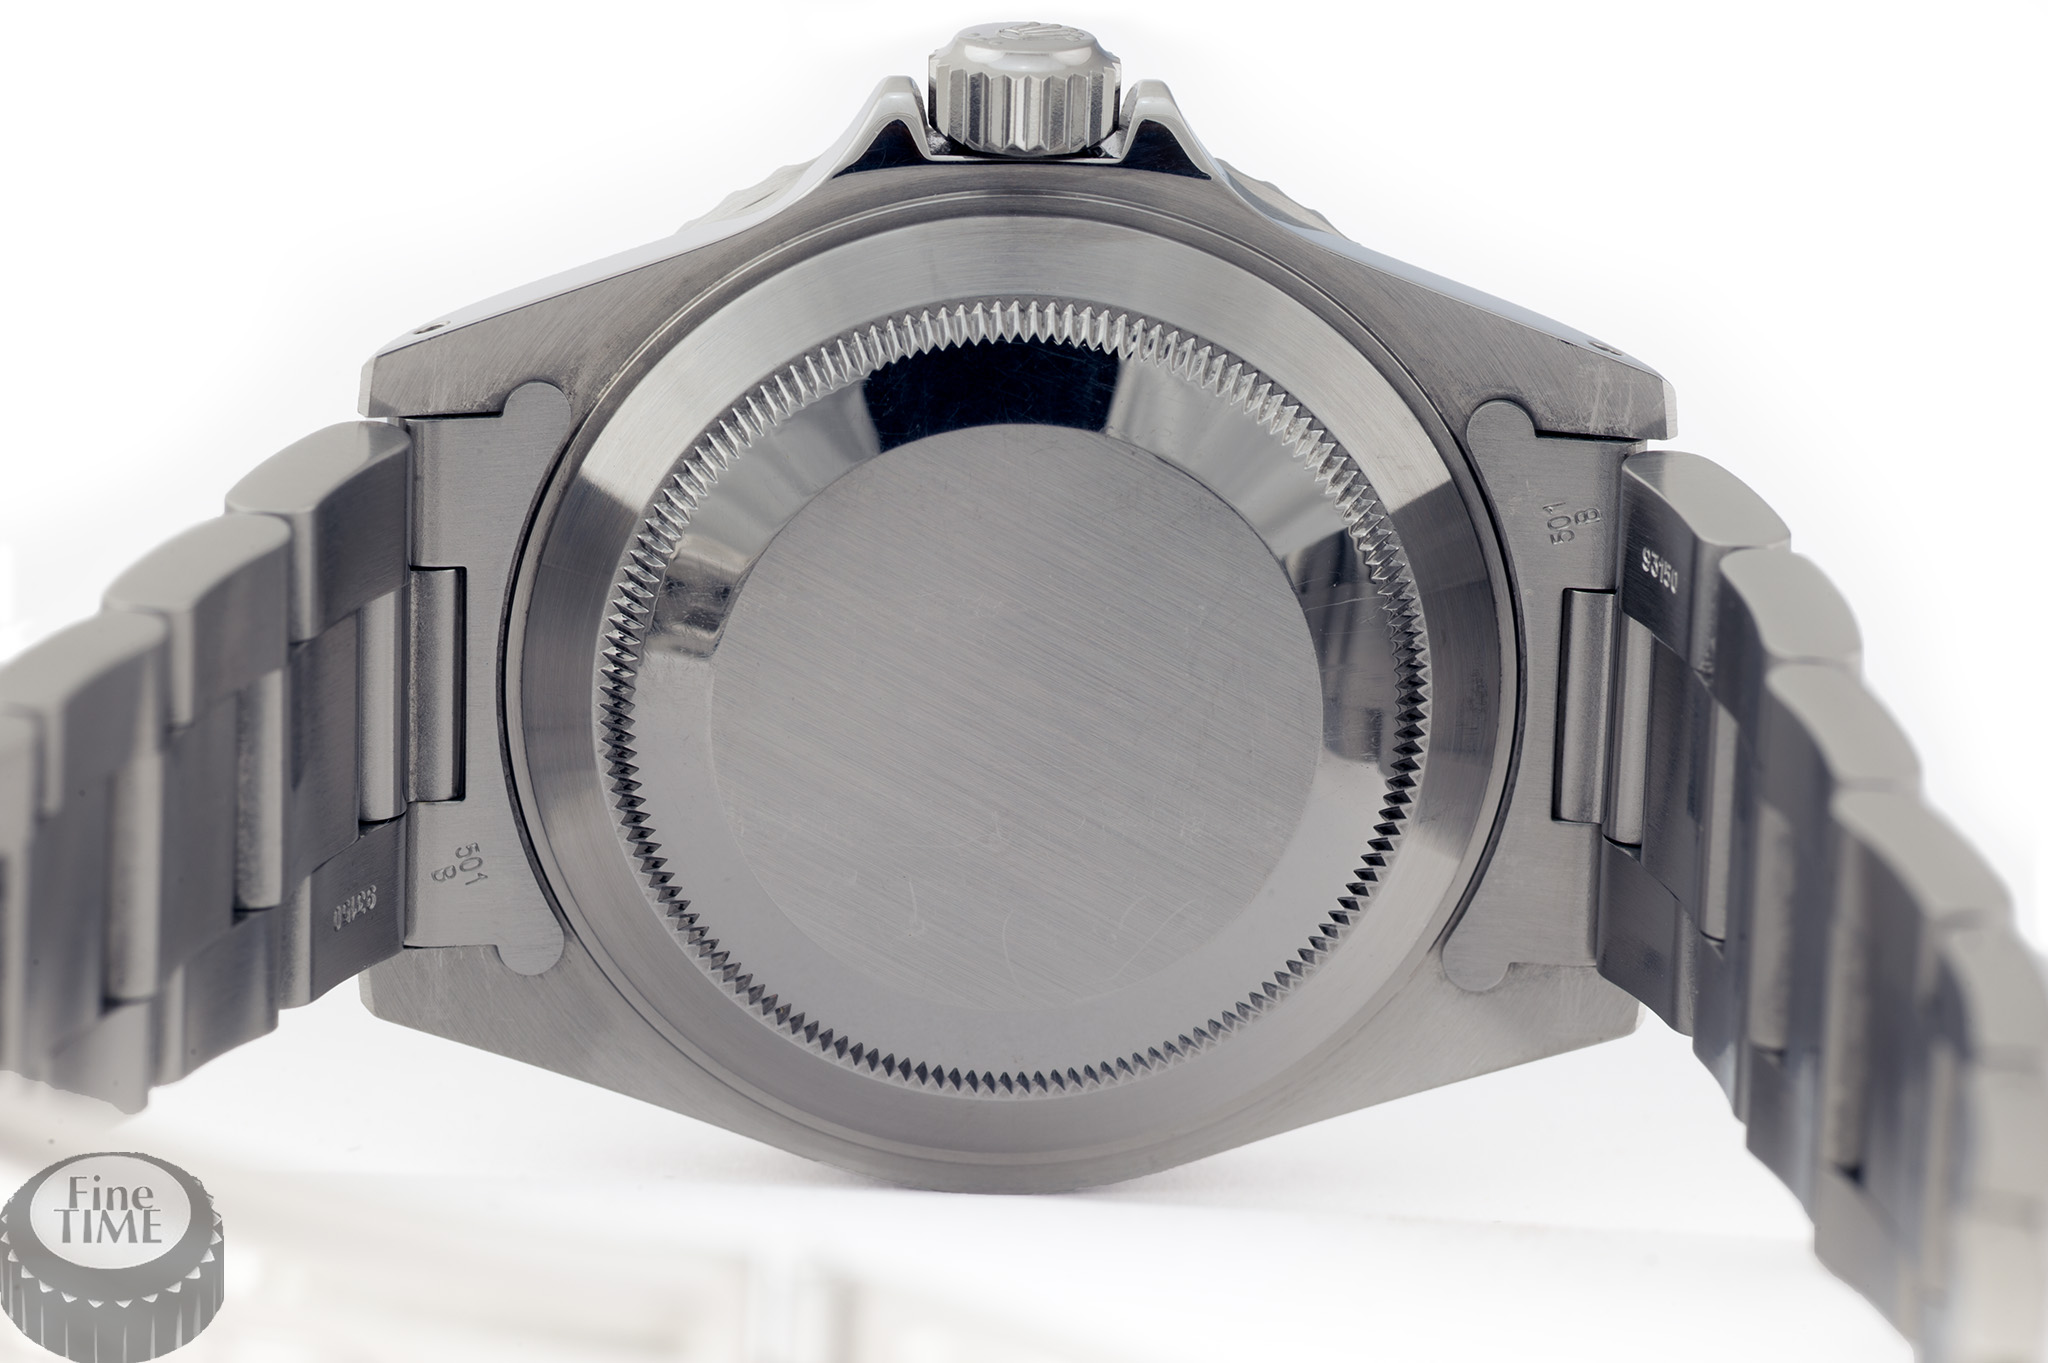 Rolex Submariner 14060M Y serie back case